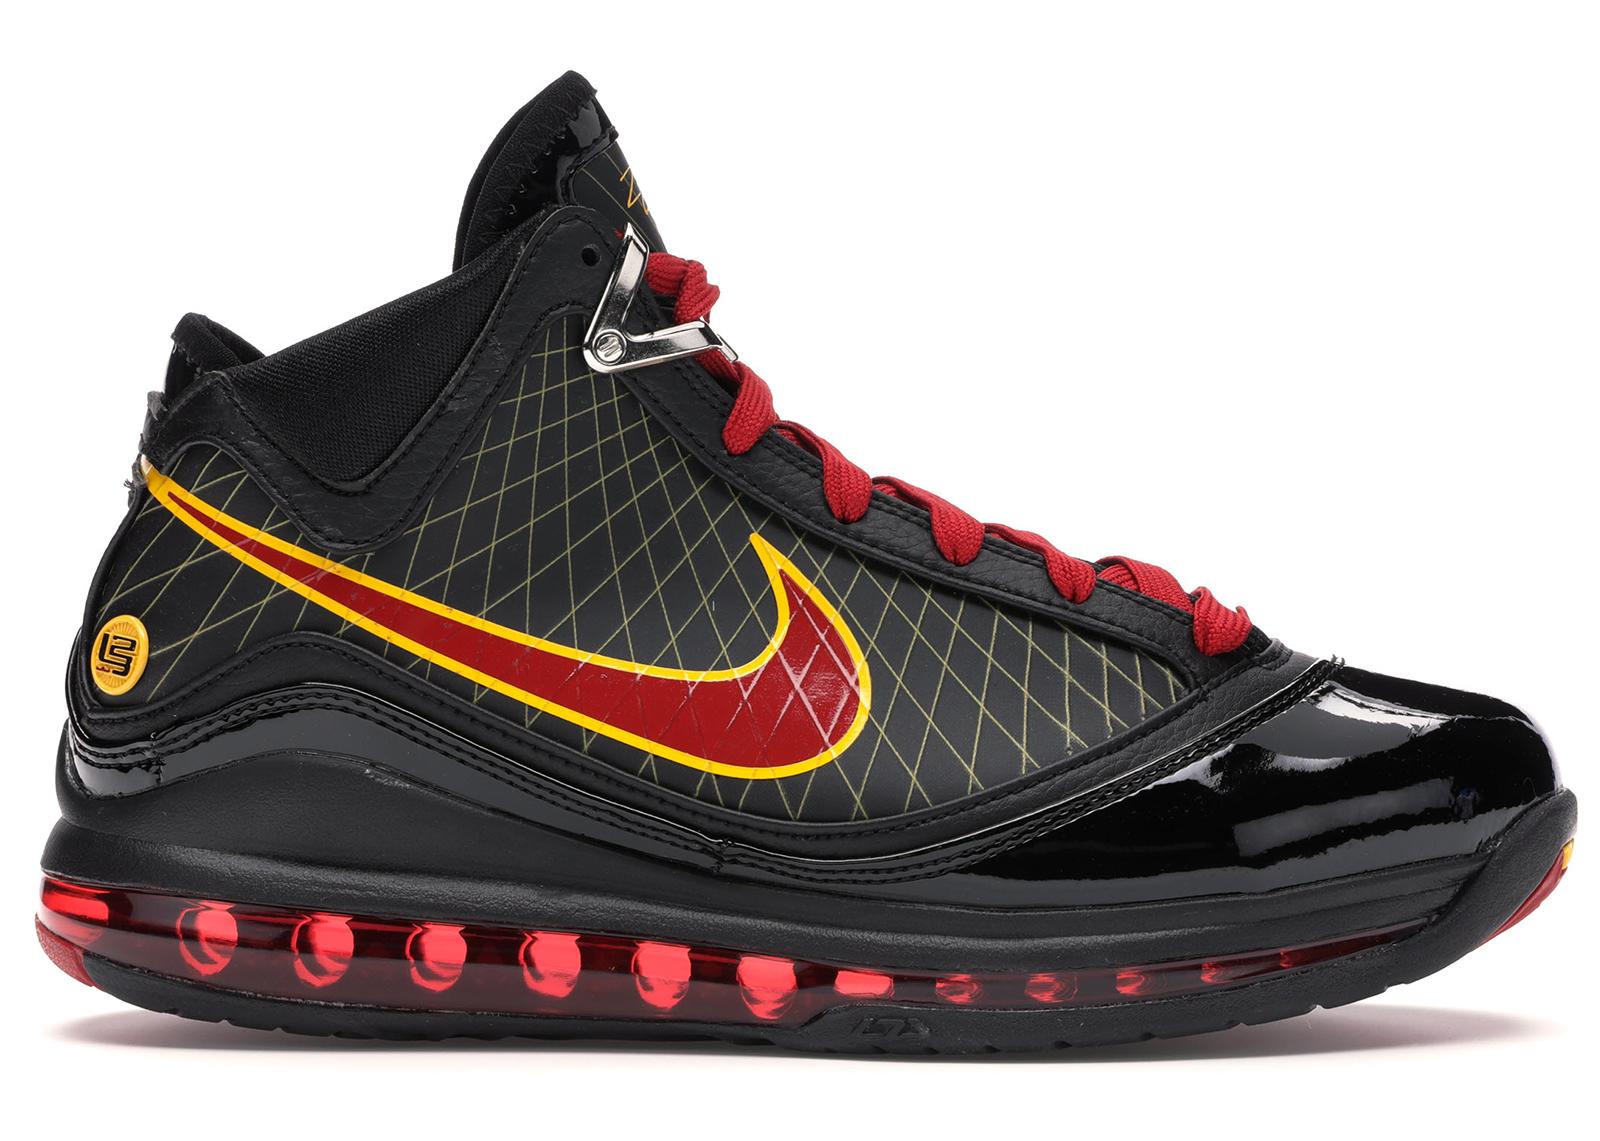 Nike LeBron 7 Fairfax Away (2020